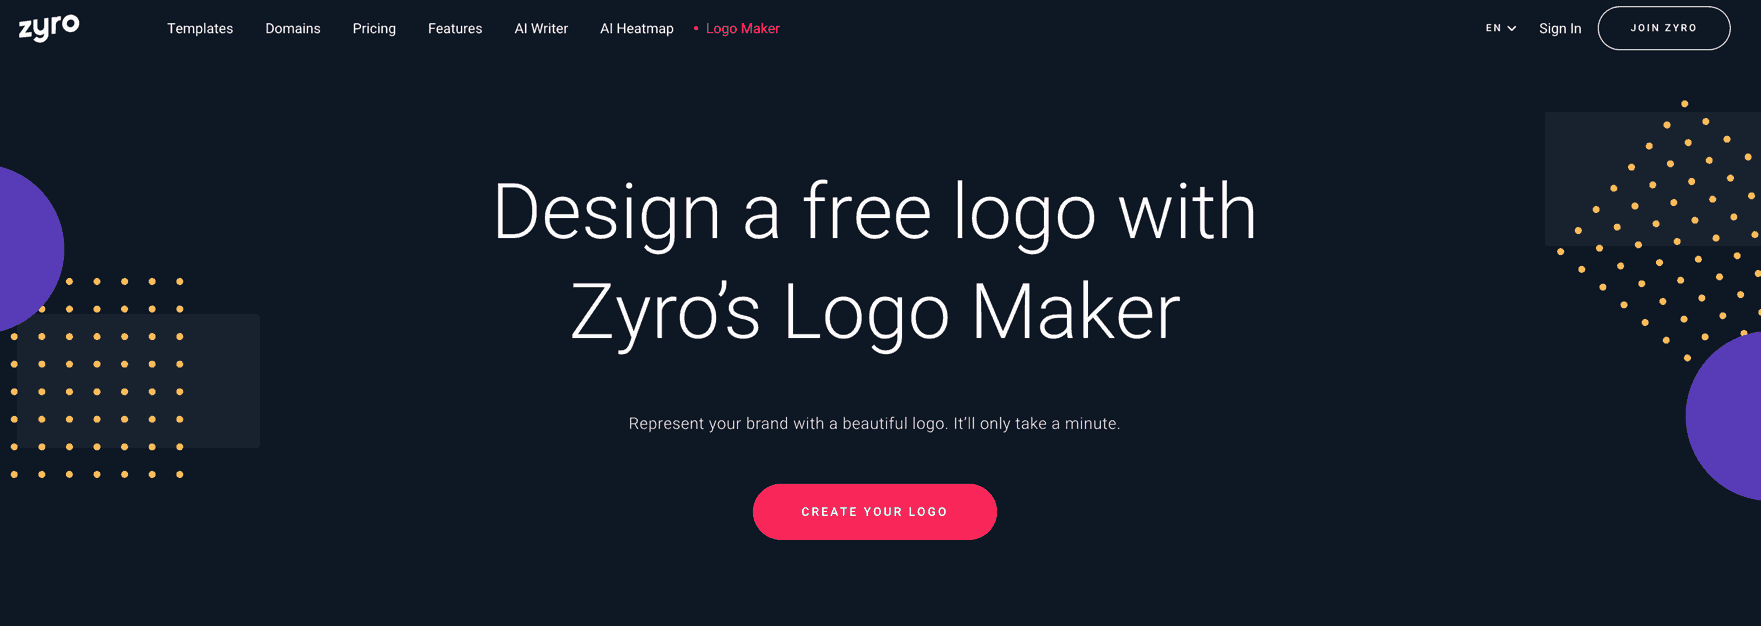 zyro content marketing example